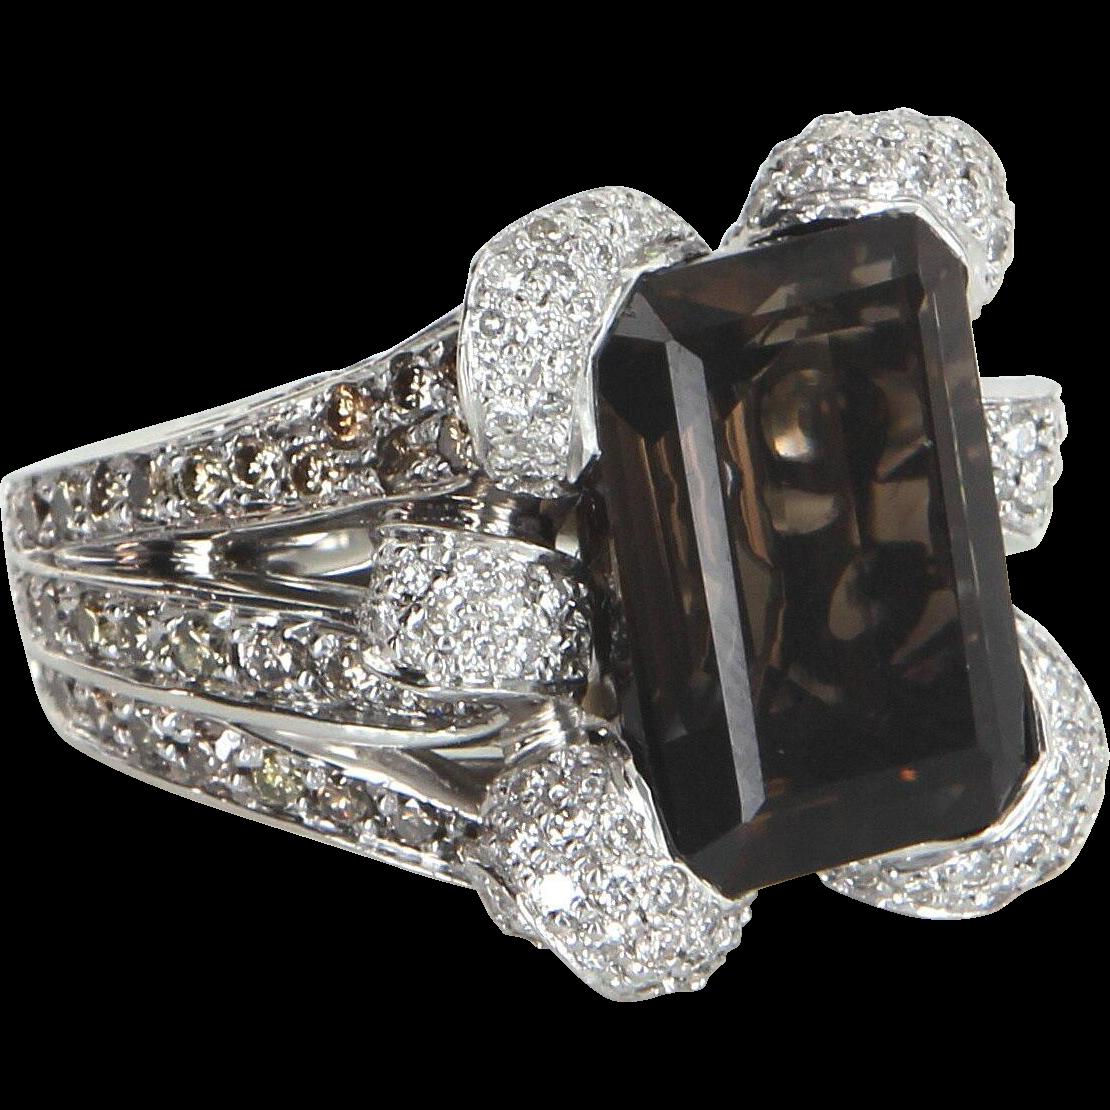 Smoky Topaz Diamond Cocktail Ring Vintage 18 Karat White Gold Estate Fine Jewelry